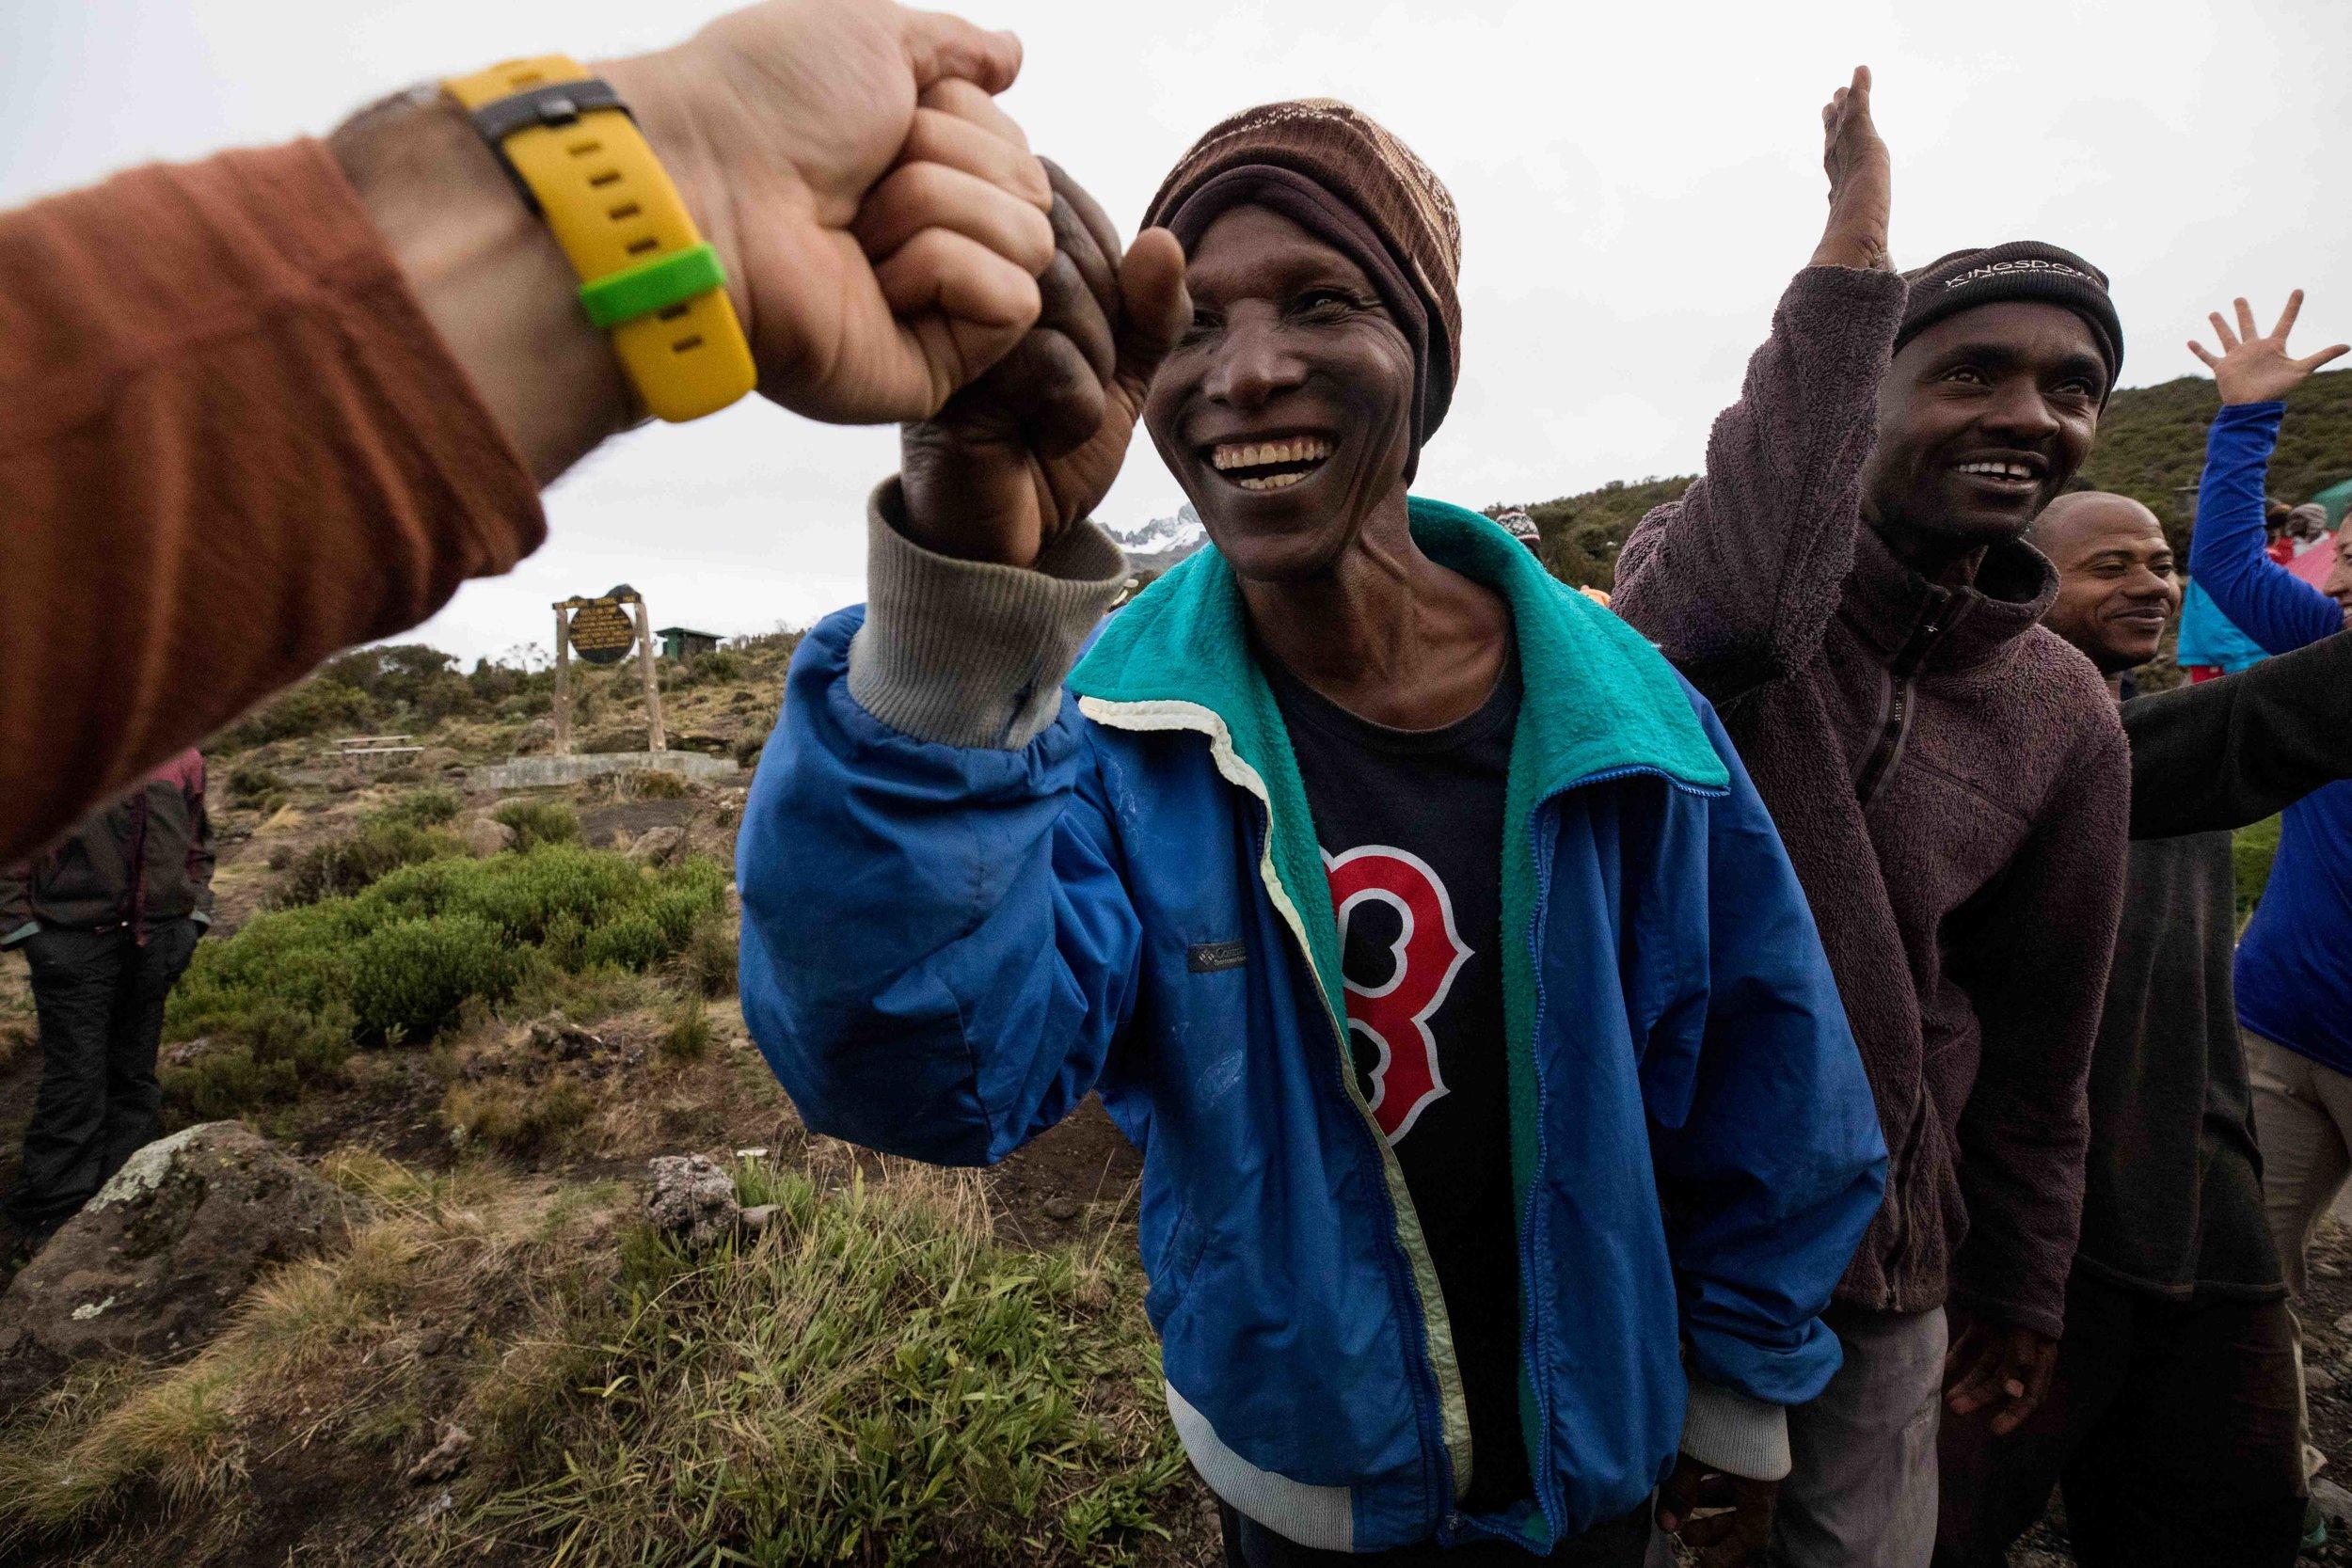 ajw_REI_Kilimanjaro-5-2.jpg